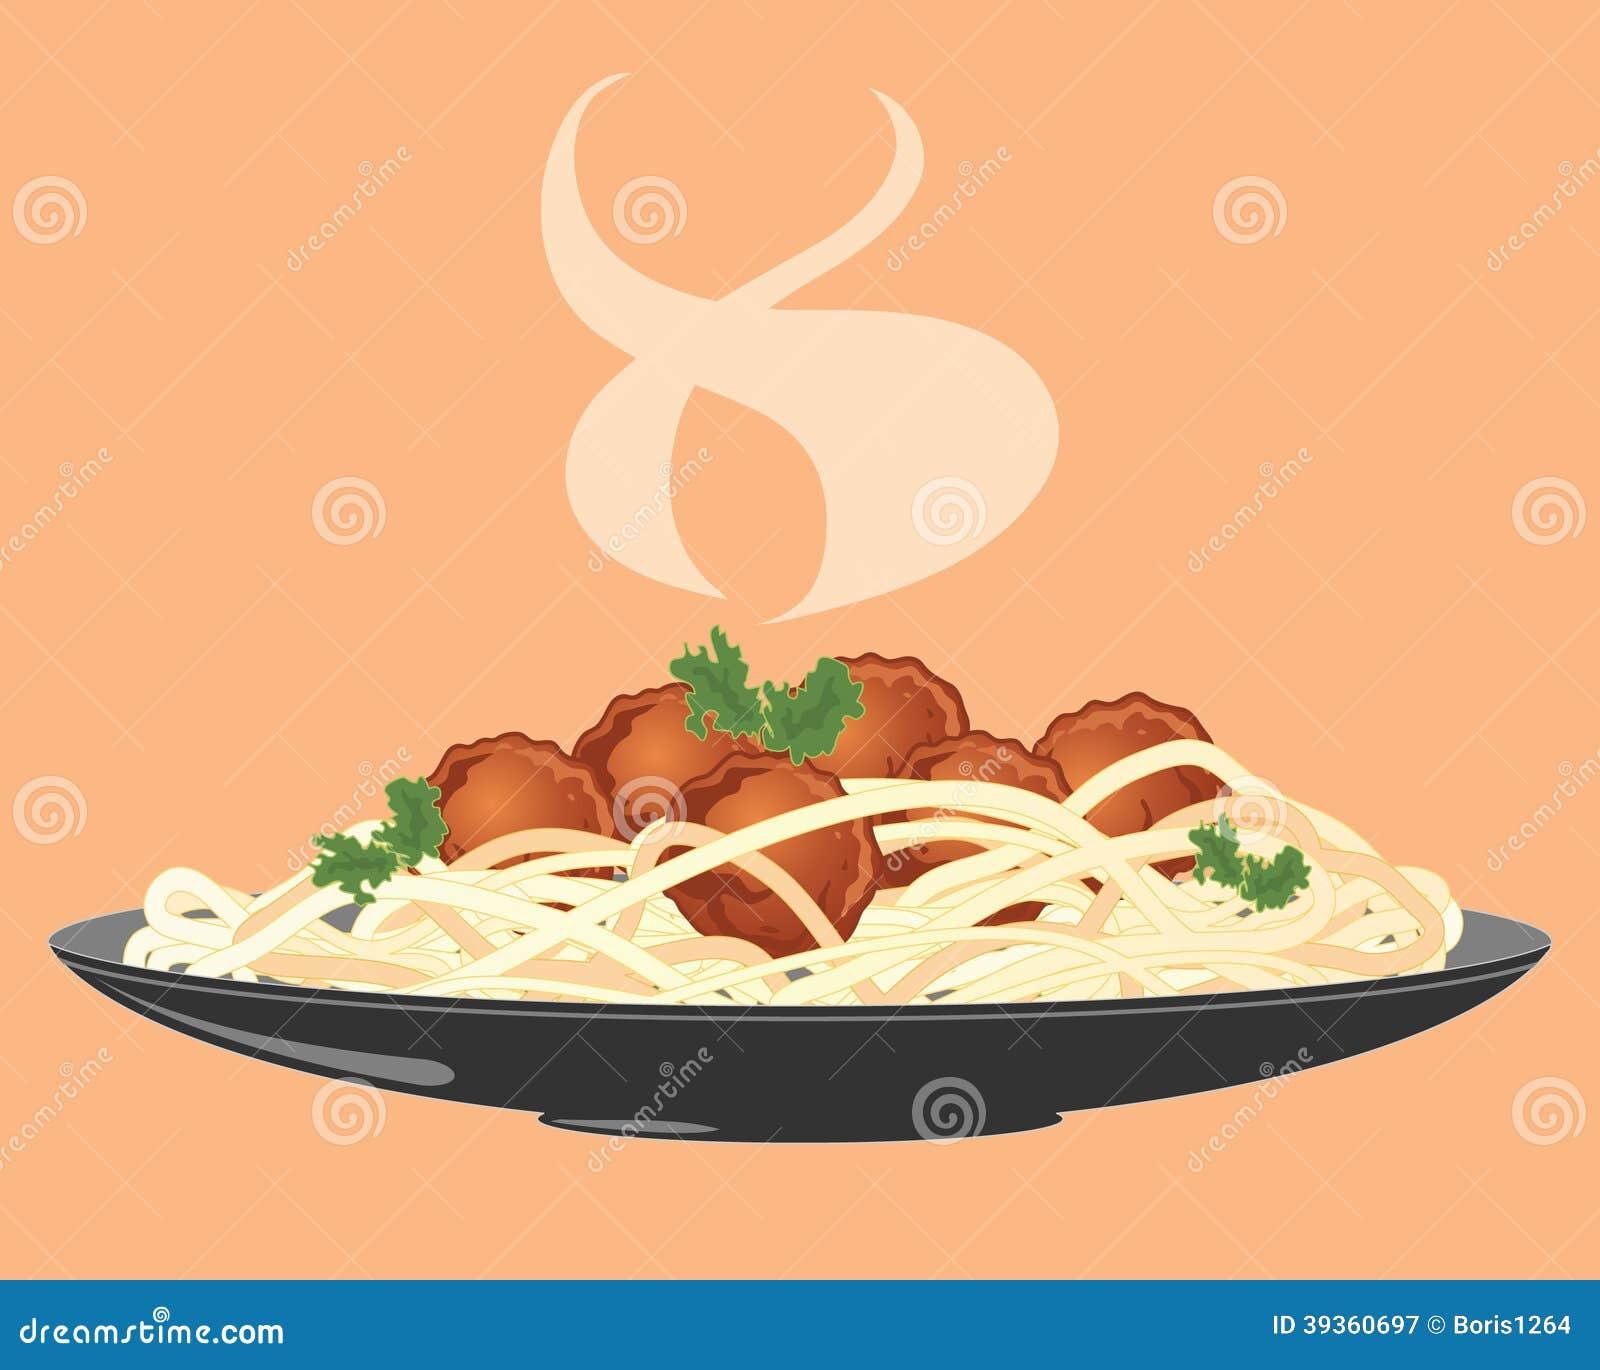 Meatballs And Spaghetti Stock Vector Image 39360697